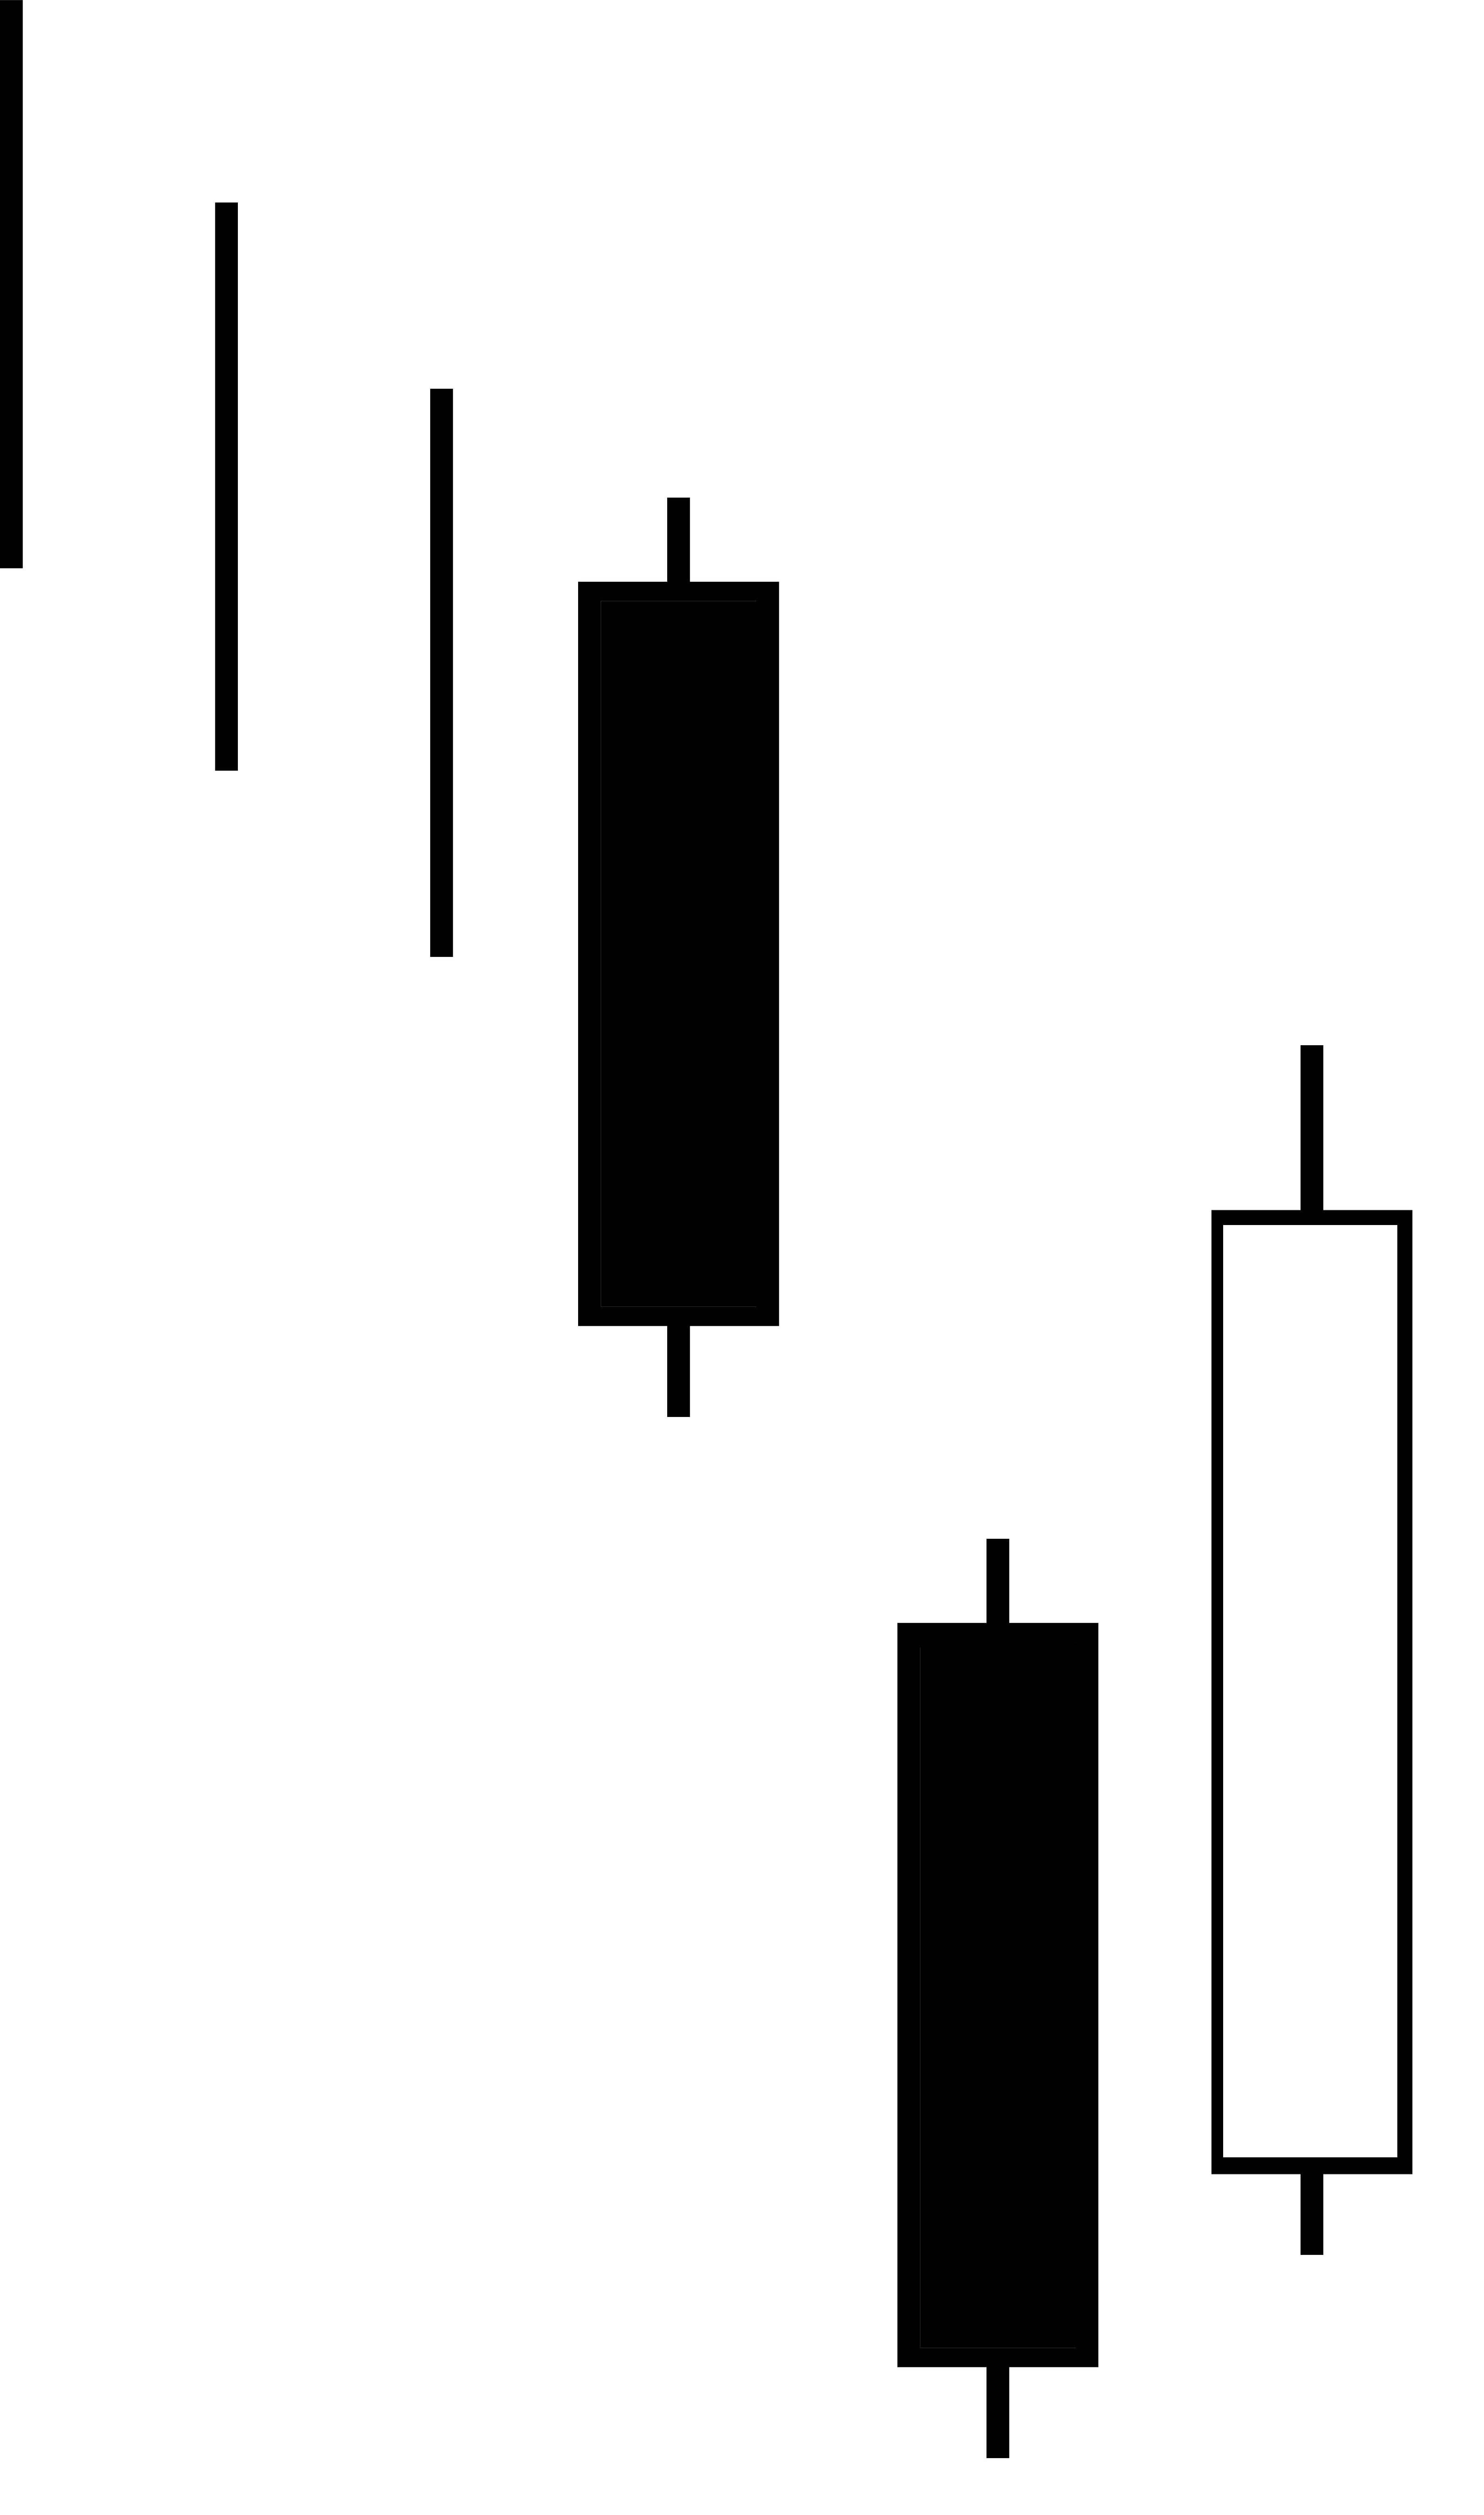 Candlestick Charts Live: Candlestick pattern bearish Downside Gap Three Methods.jpg ,Chart